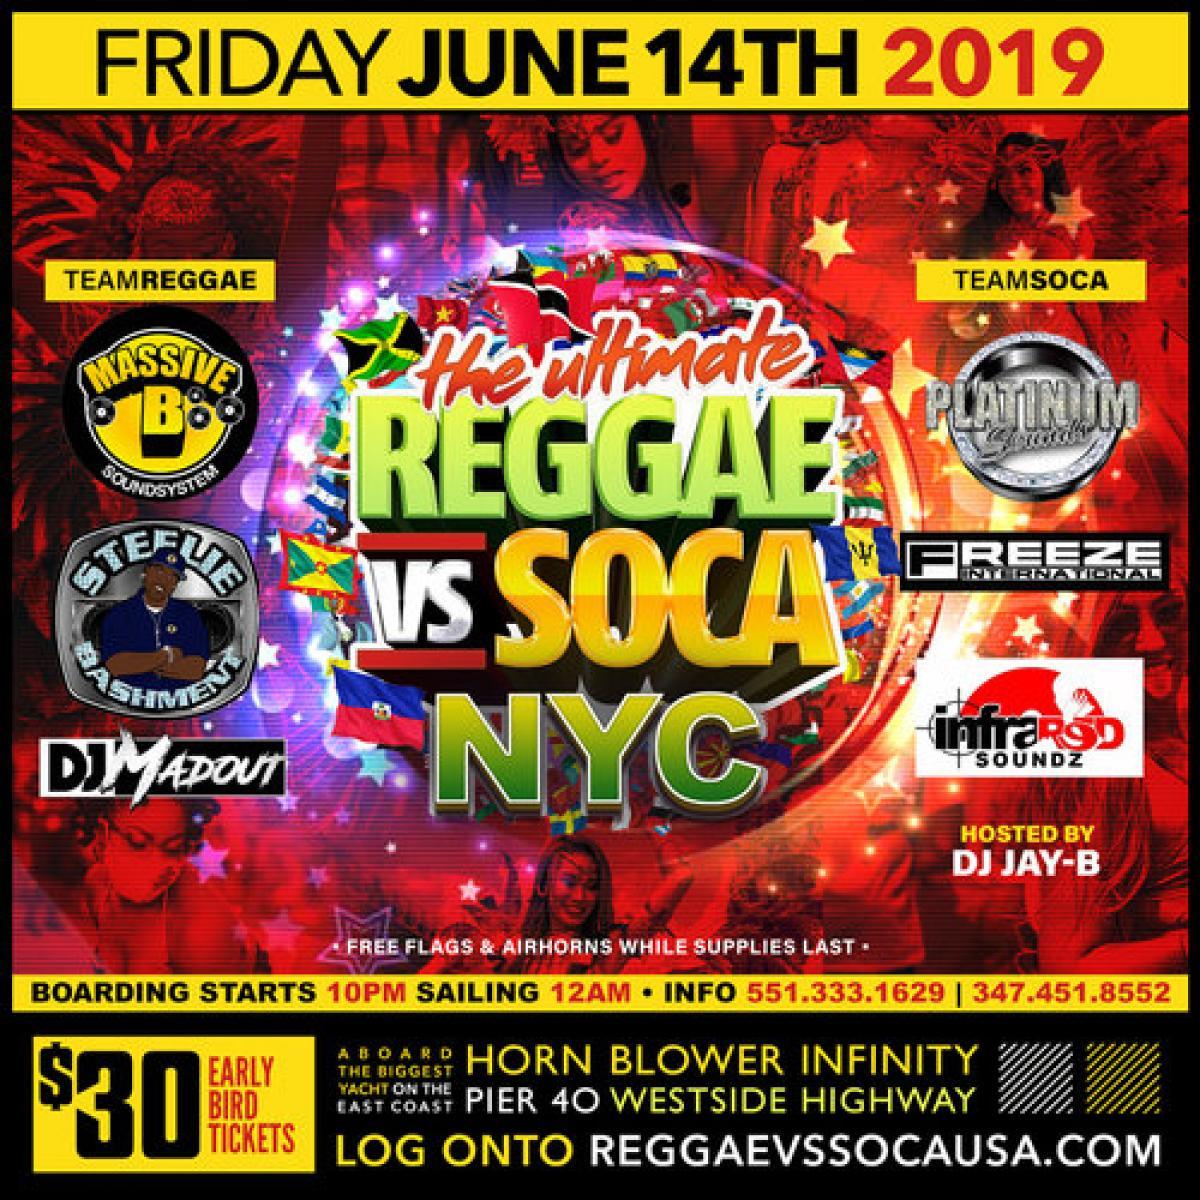 The Ultimate Reggae vs Soca flyer or graphic.